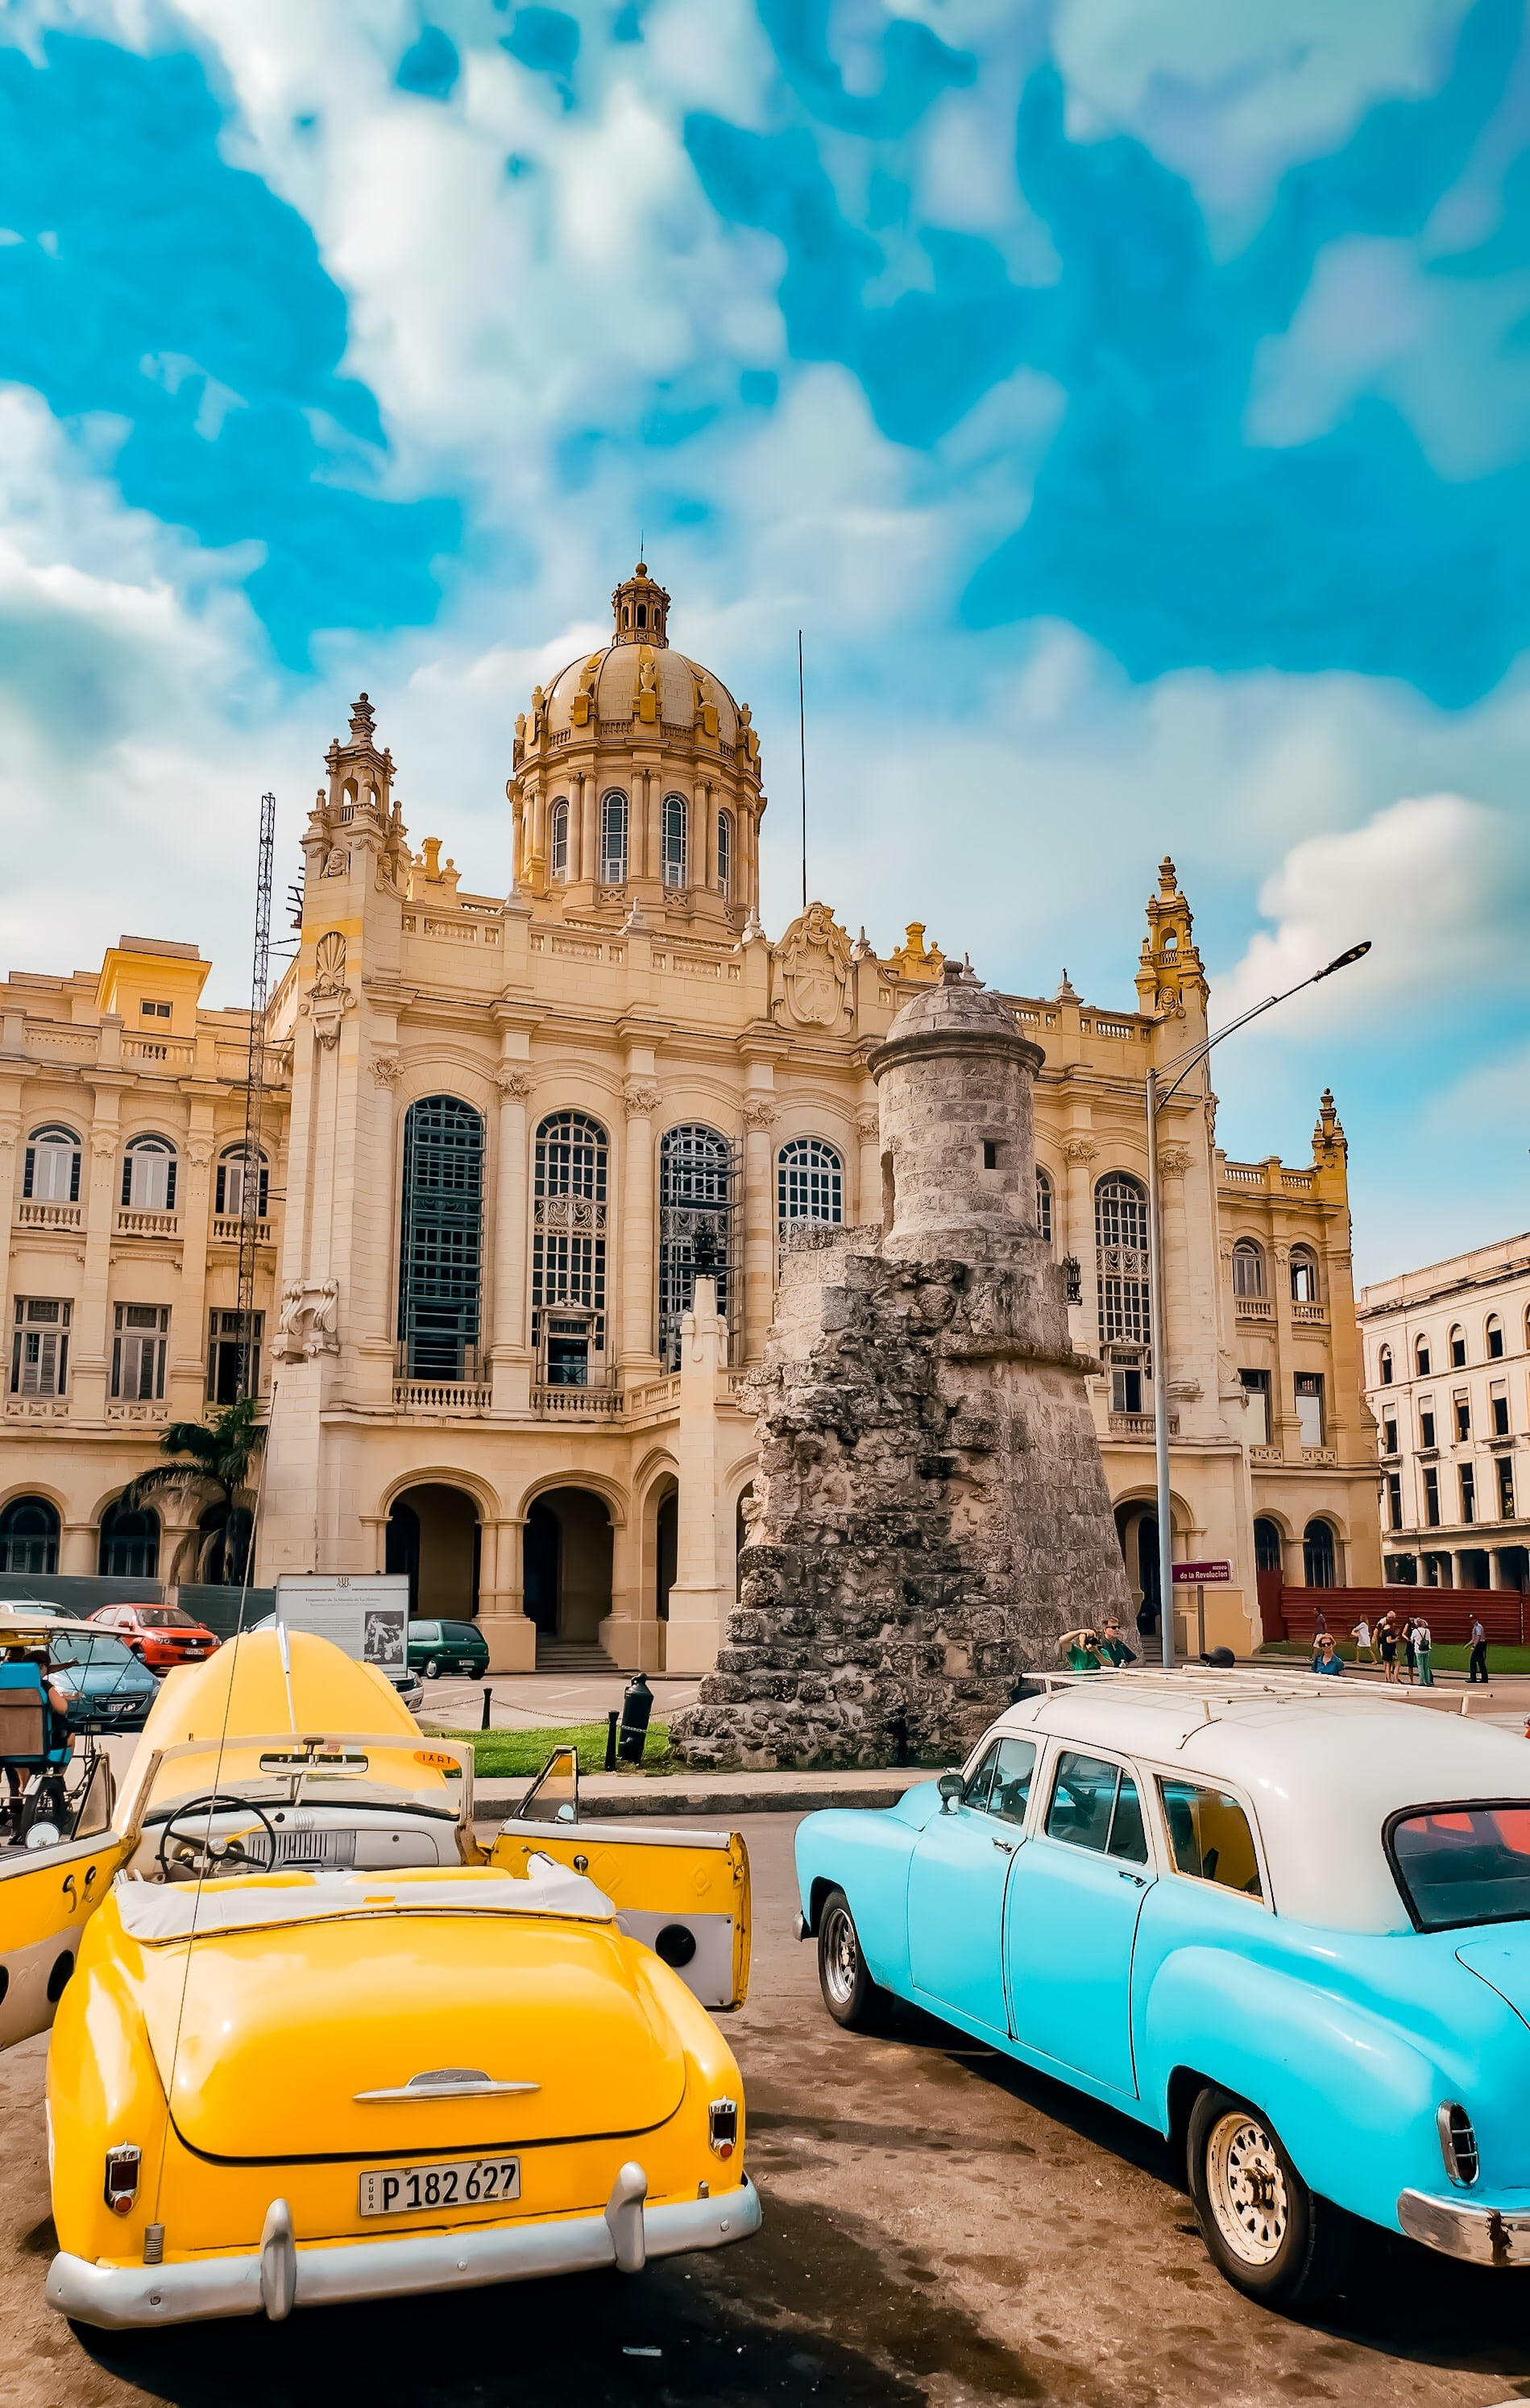 Havana_presidential_palace_classic_cars.JPEG